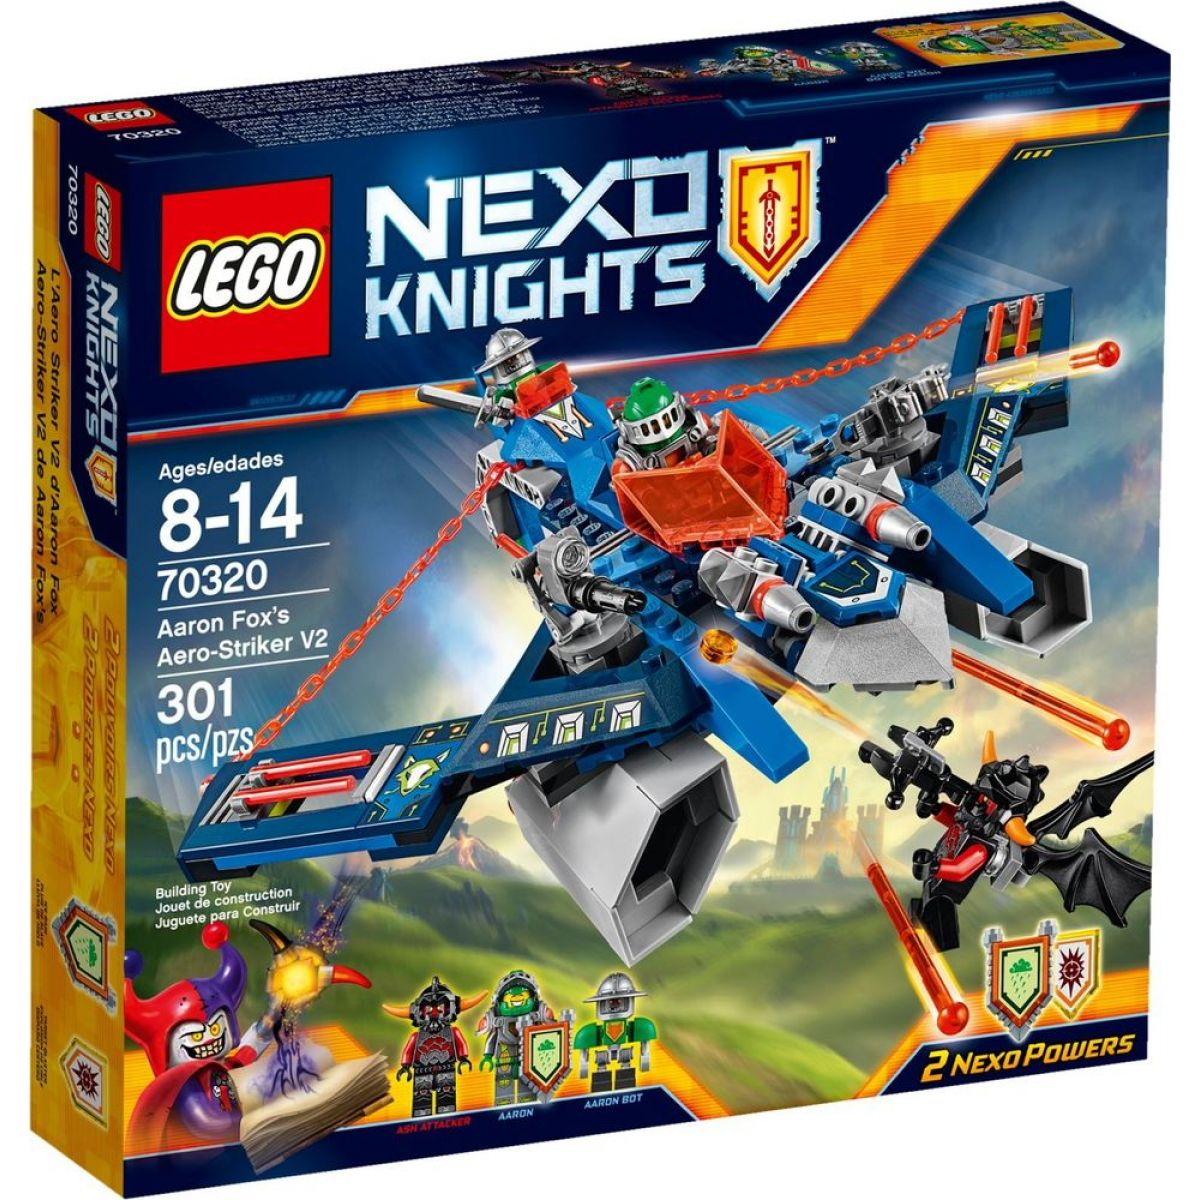 LEGO Nexo Knights 70320 Aaronův Aero Striker V2